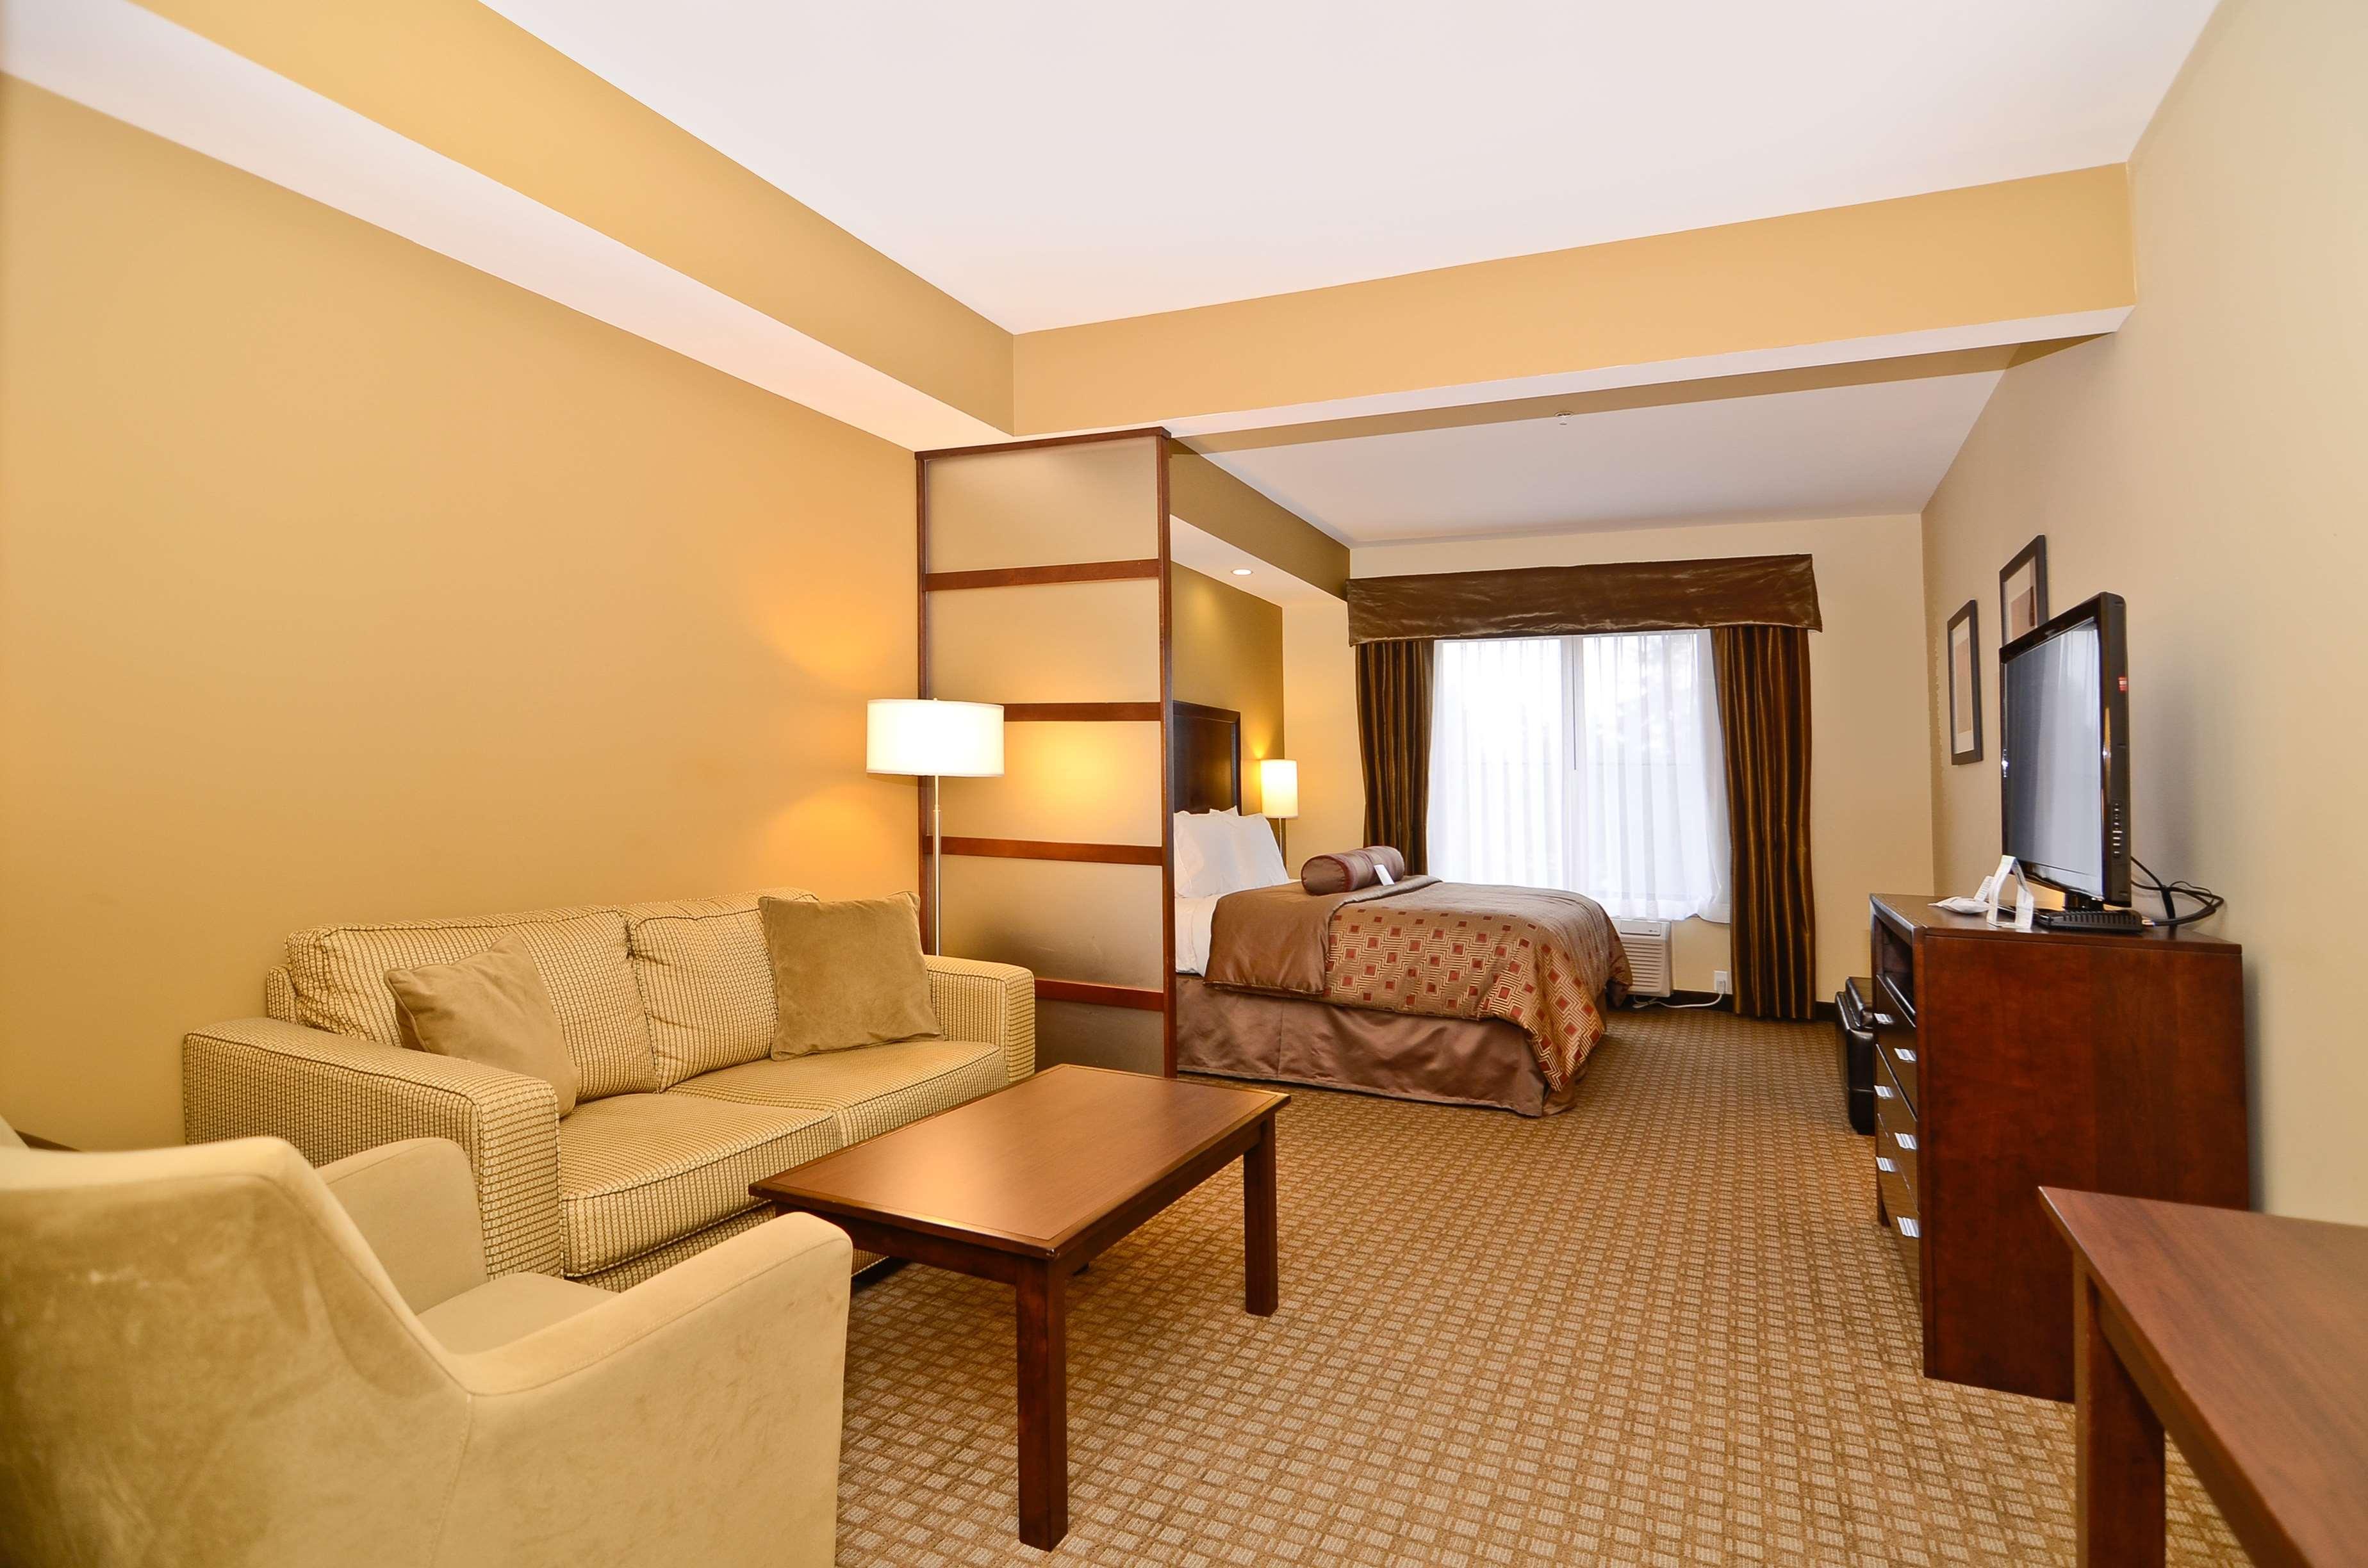 Best Western Plus Lacey Inn & Suites image 20